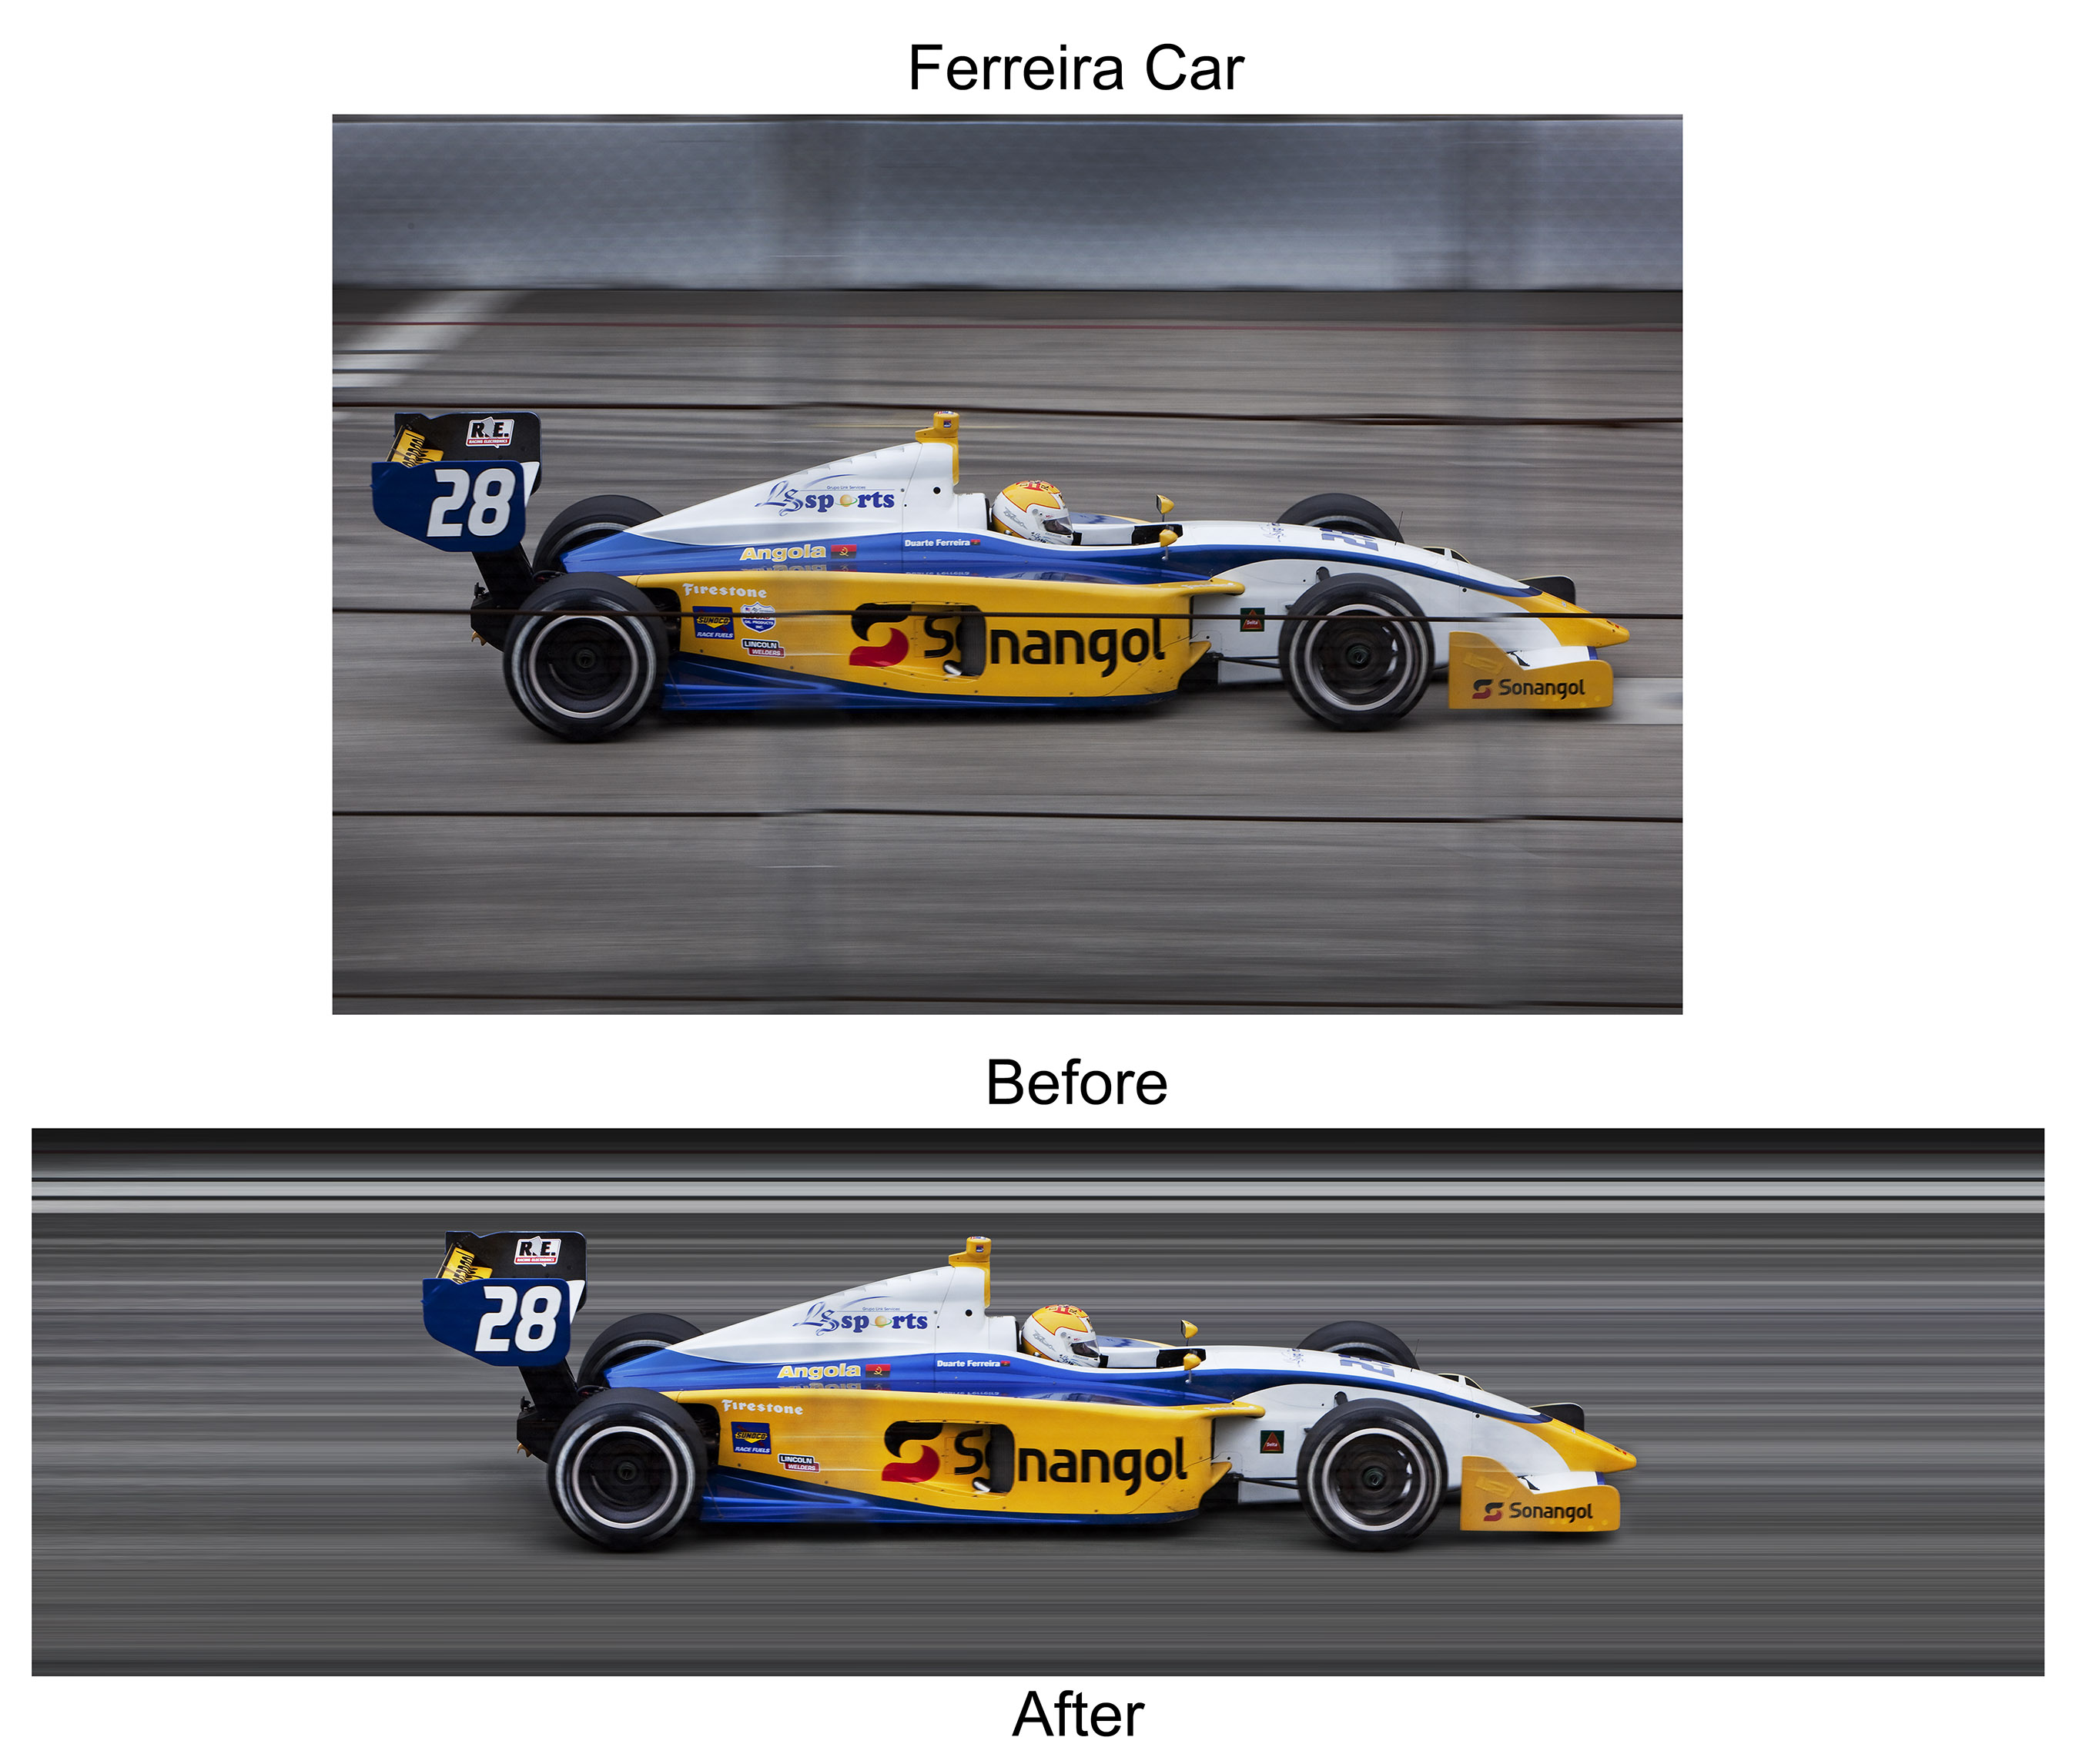 Ferreira Car